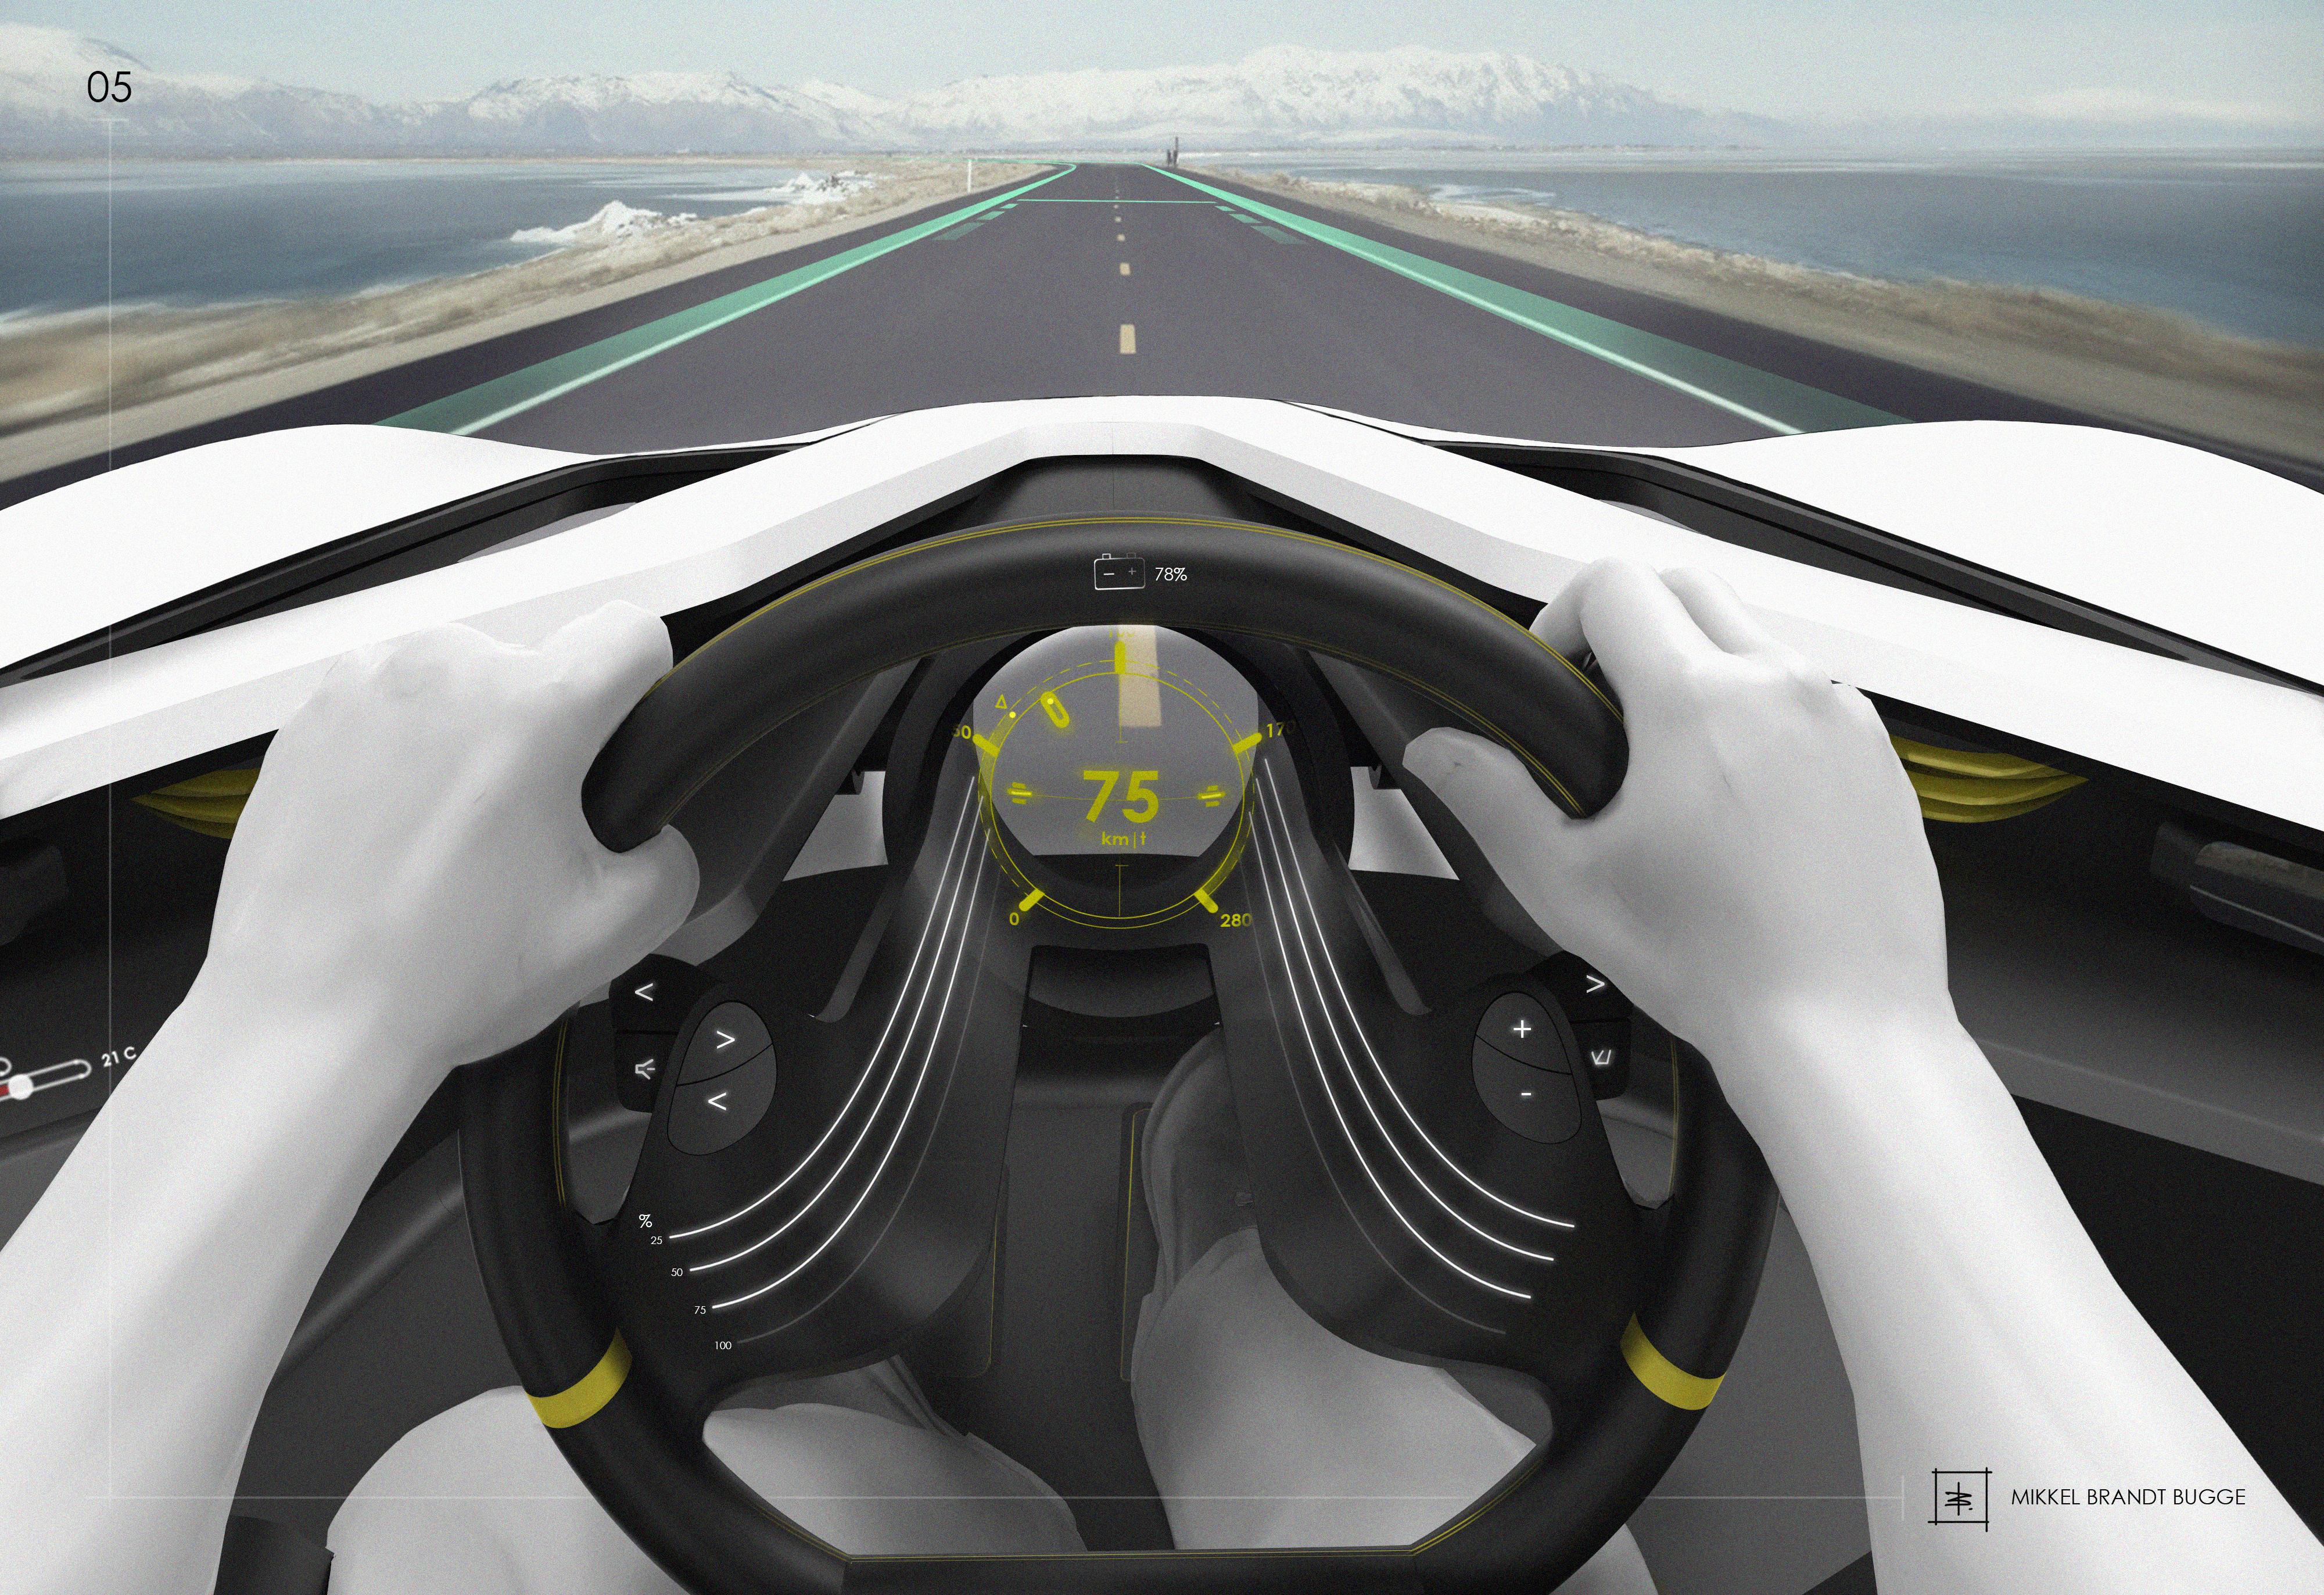 Saab interior by Mikkel Brandt bugge